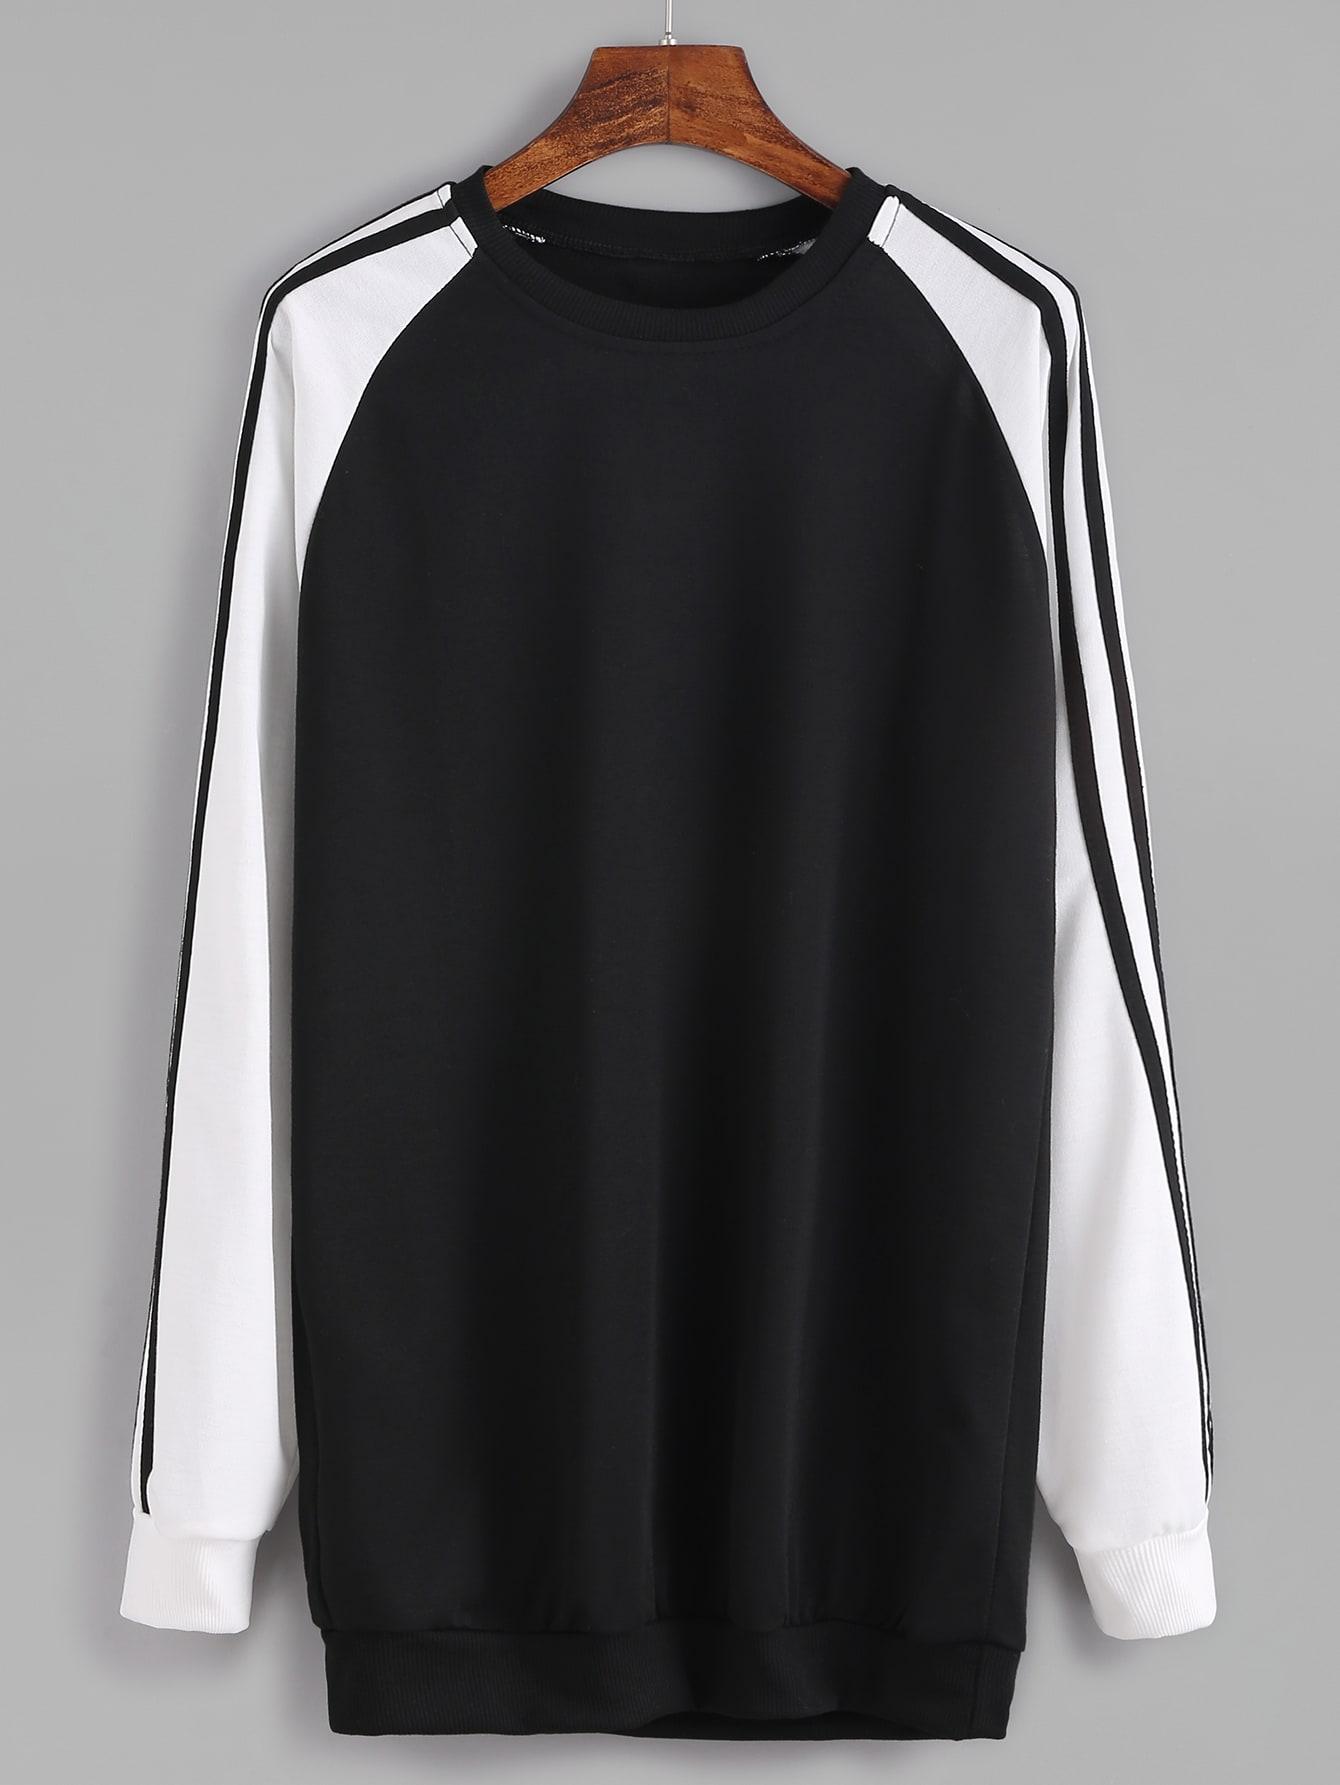 Contrast Raglan Sleeve Striped Trim Sweatshirt sweatshirt161003103